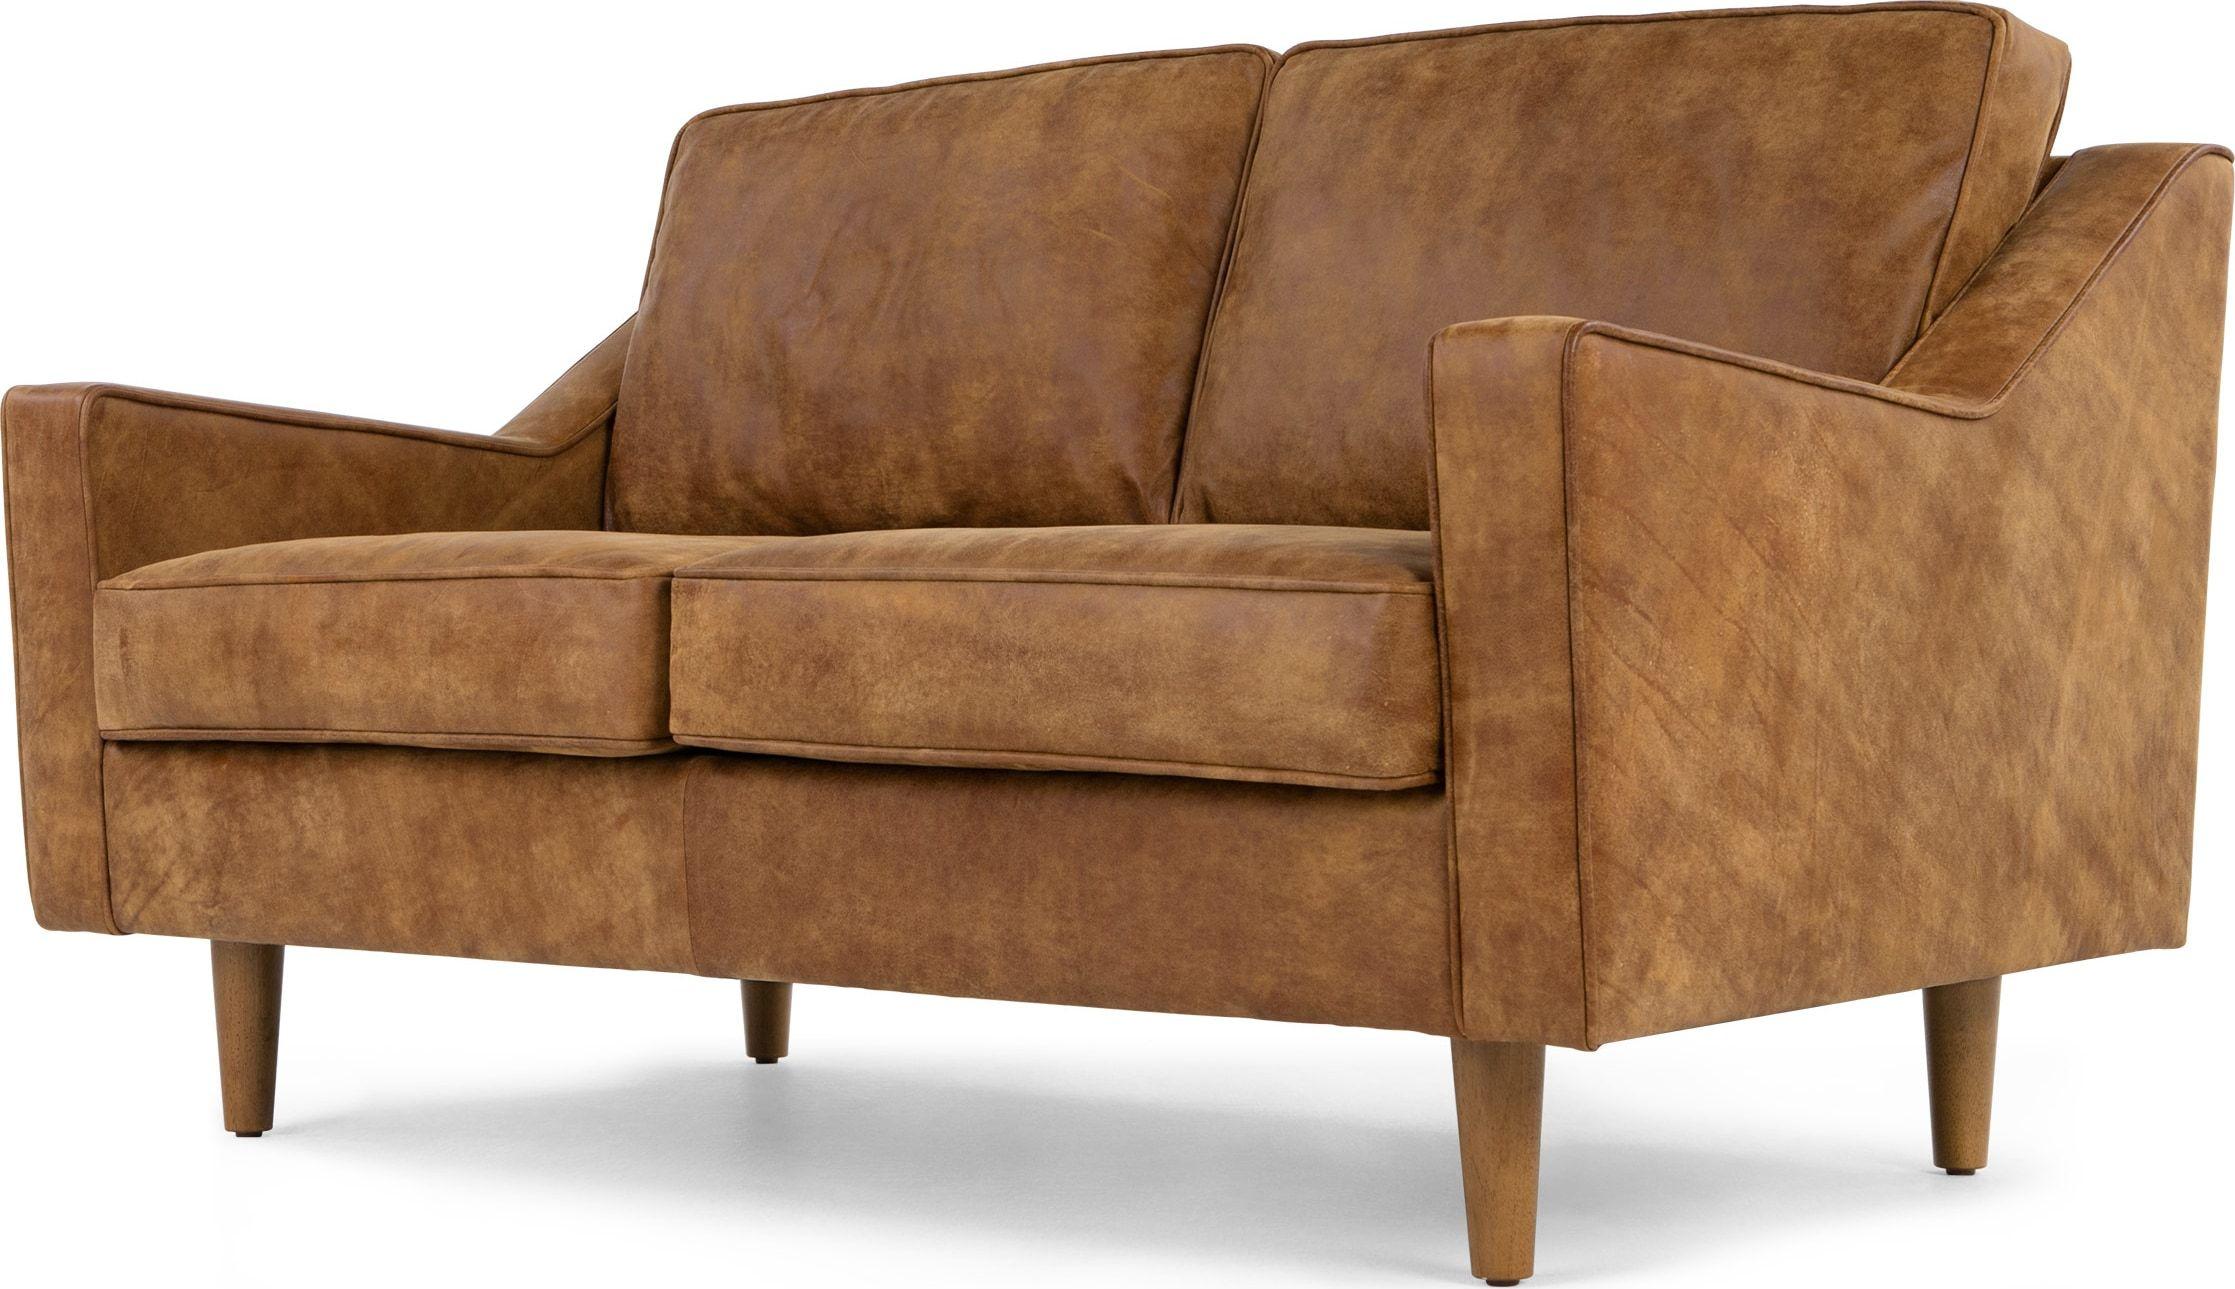 Dallas 2 Seater Sofa Outback Tan Premium Leather 2 Seater Sofa Two Seater Leather Sofa Vintage Sofa